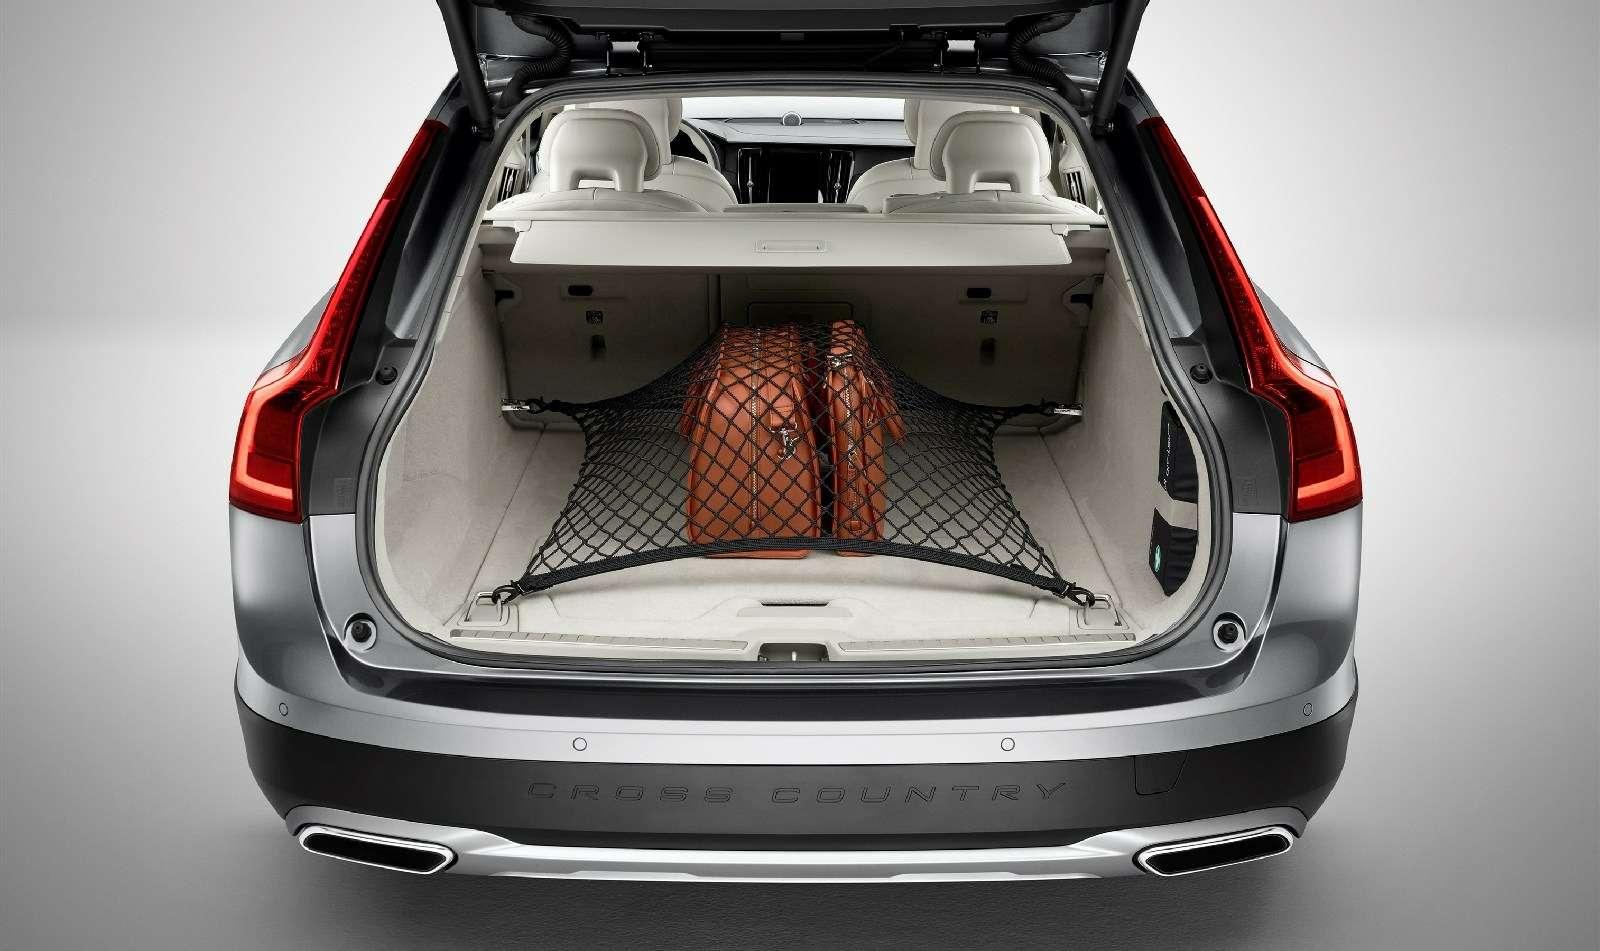 Такой «сарай» нам нужен: Volvo V90 Cross Country представлен официально— фото 635258